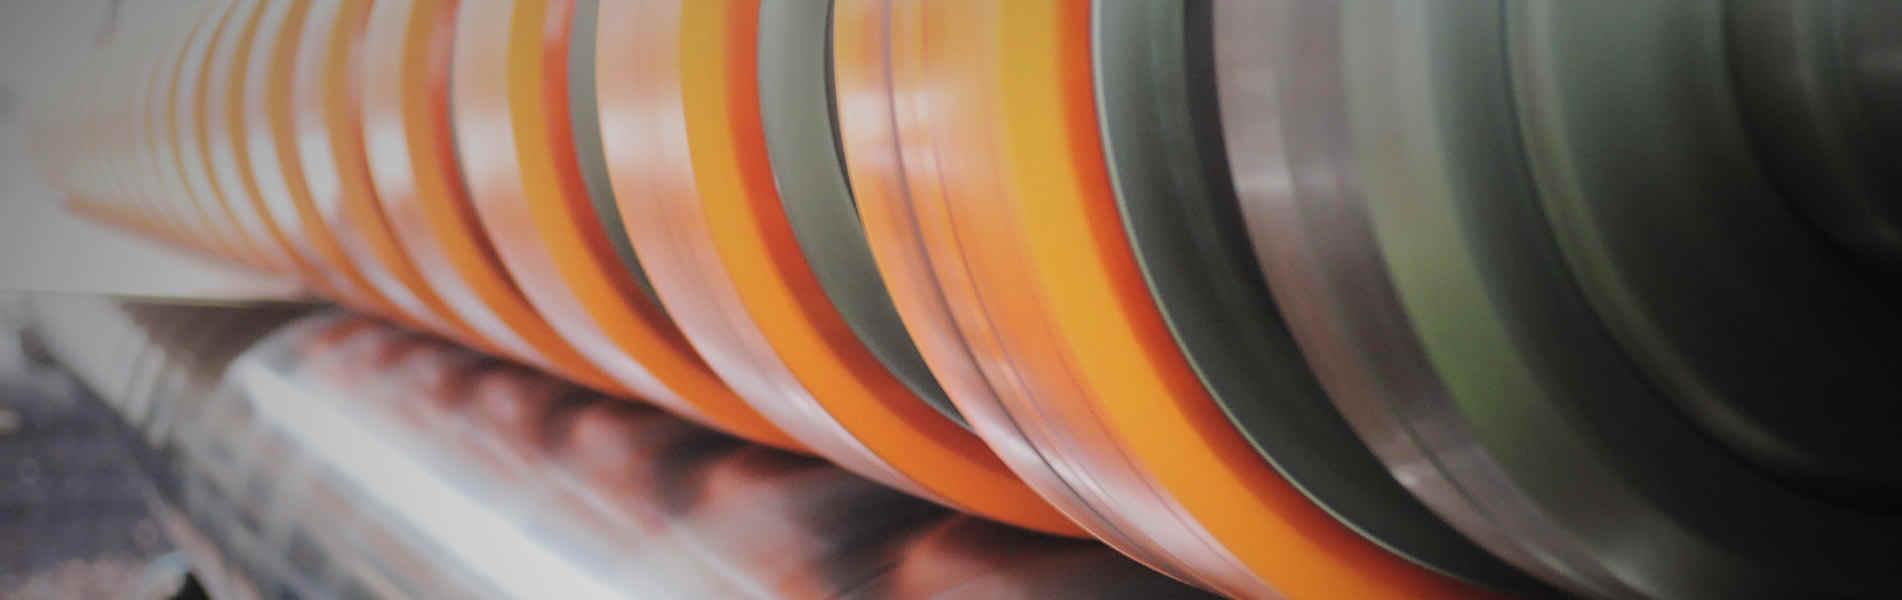 Corrugating line re-installation